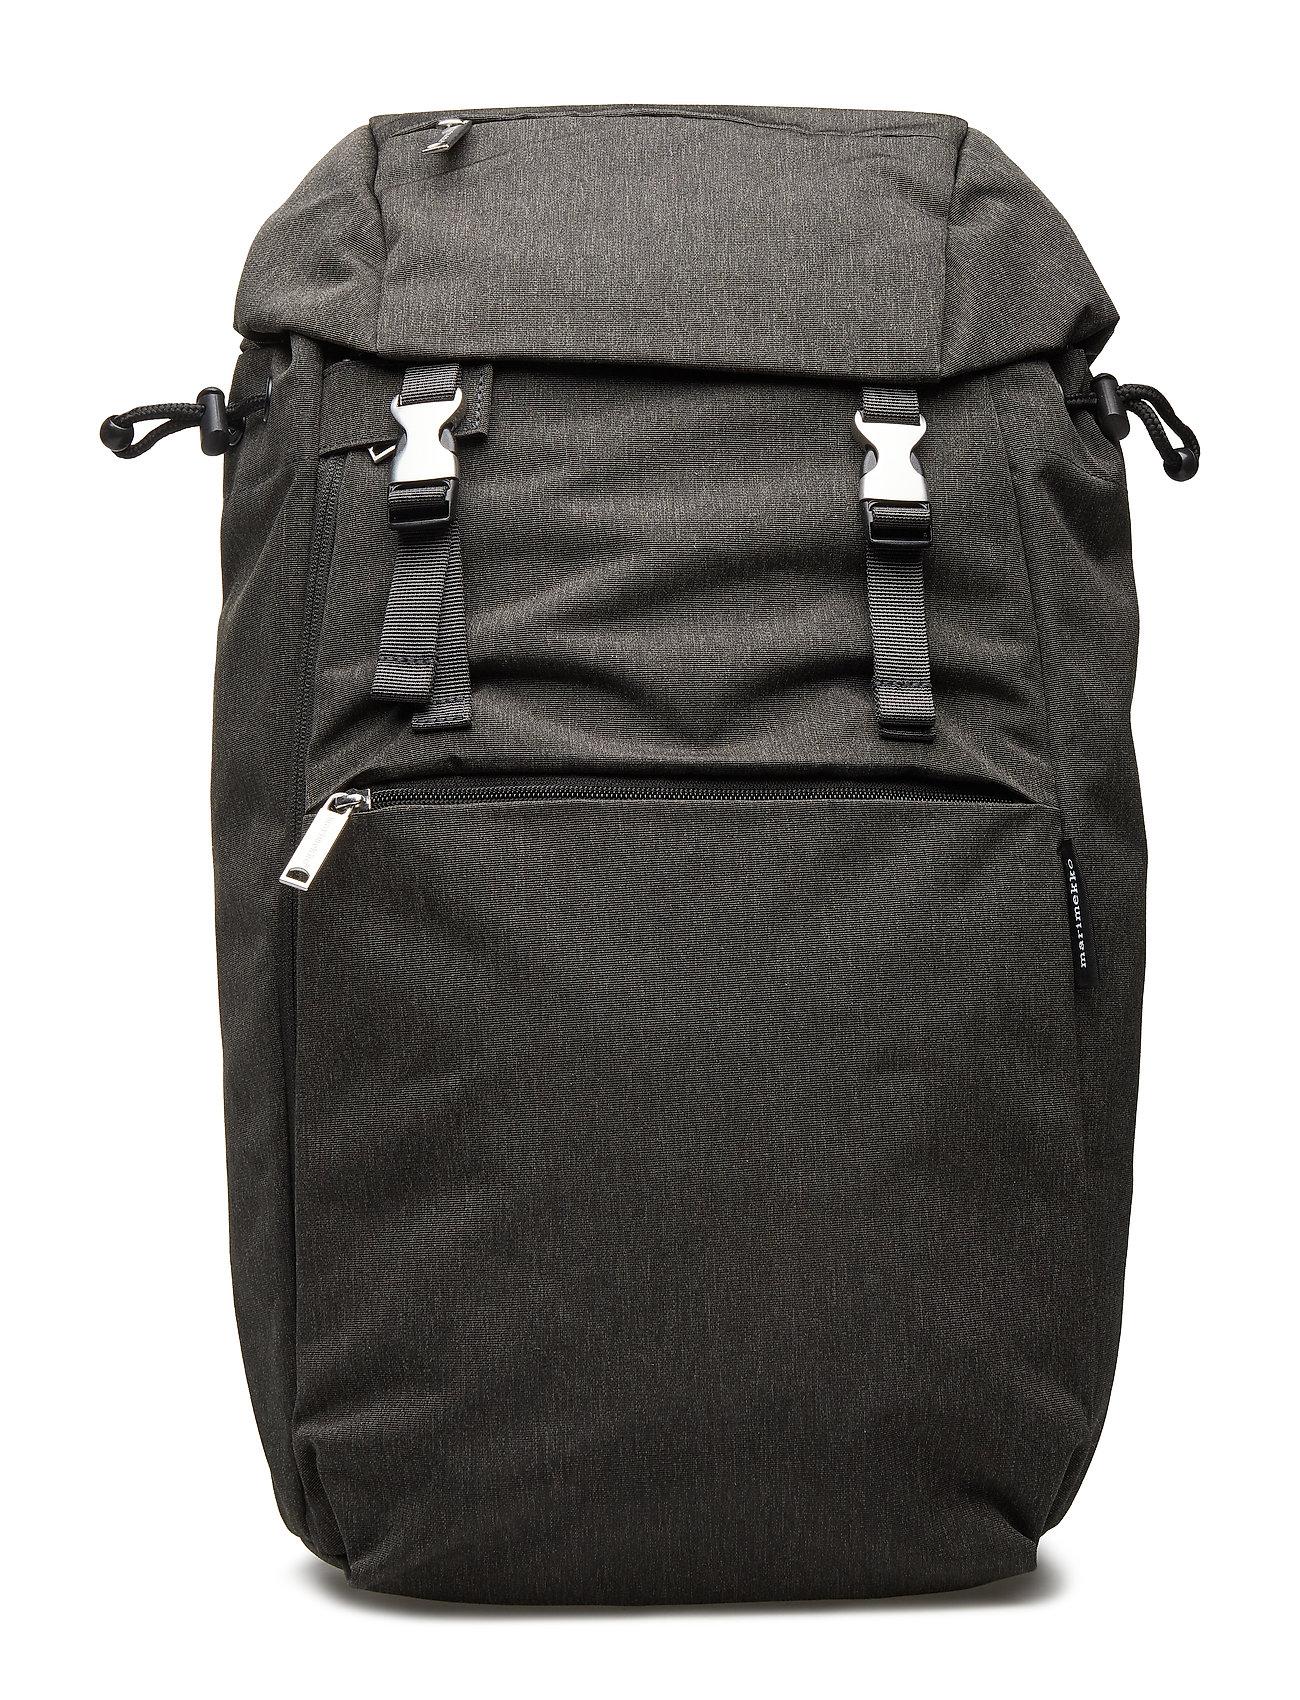 Marimekko KORTTELI backpack